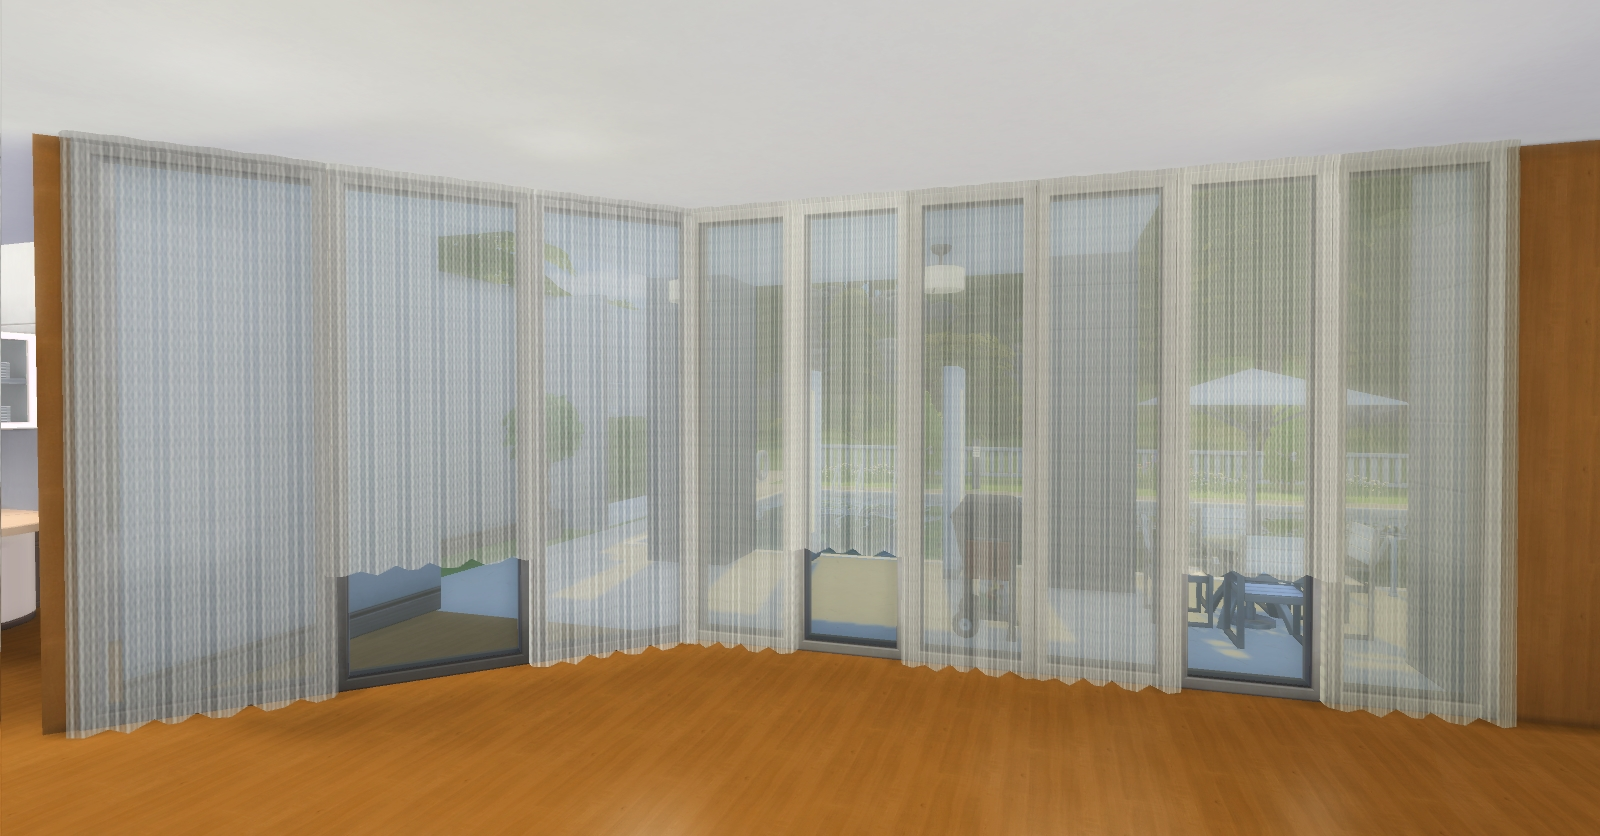 6 1 2 Sips Curtain Wall : Mod the sims lokoma curtains